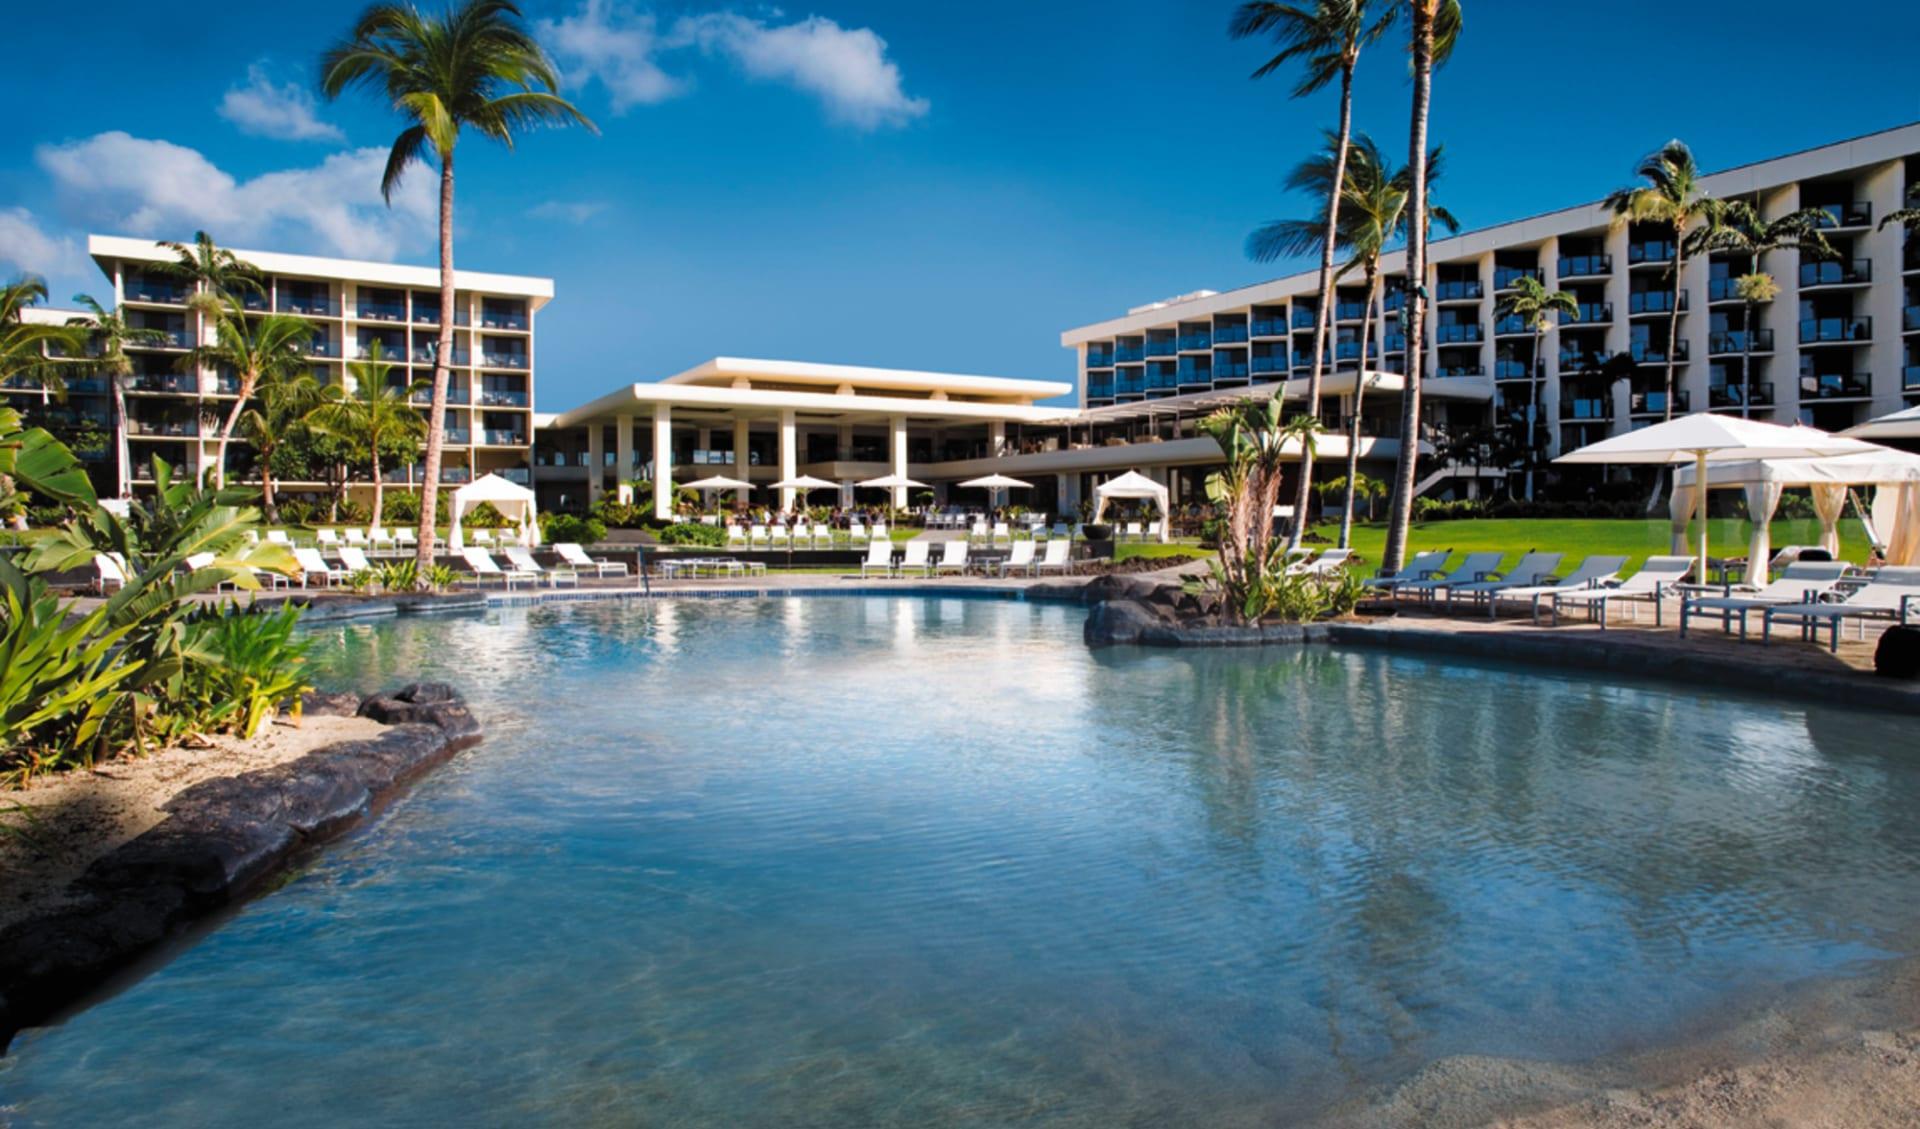 Waikoloa Beach Marriott Resort & Spa: exterior waikoloa beach marriott resort and spa hotelanlage